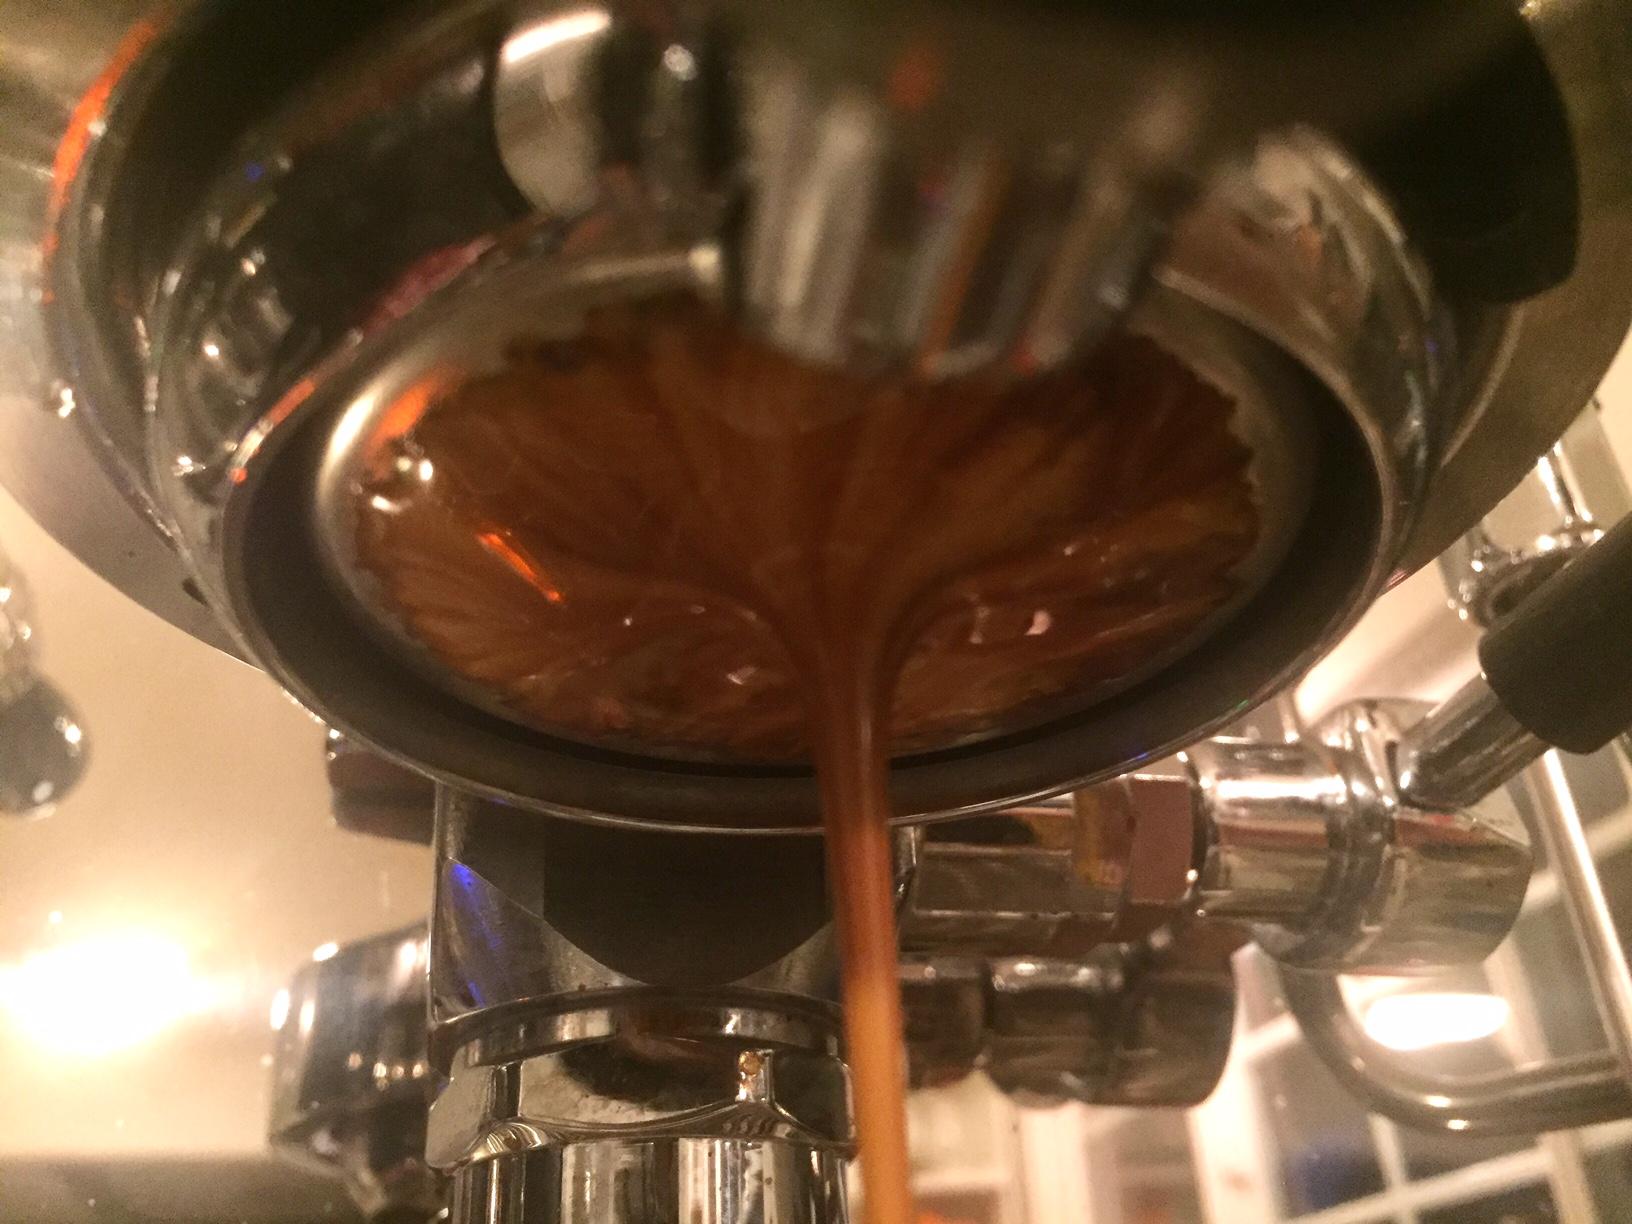 Ceremony Coffee Roasters Espresso Shot